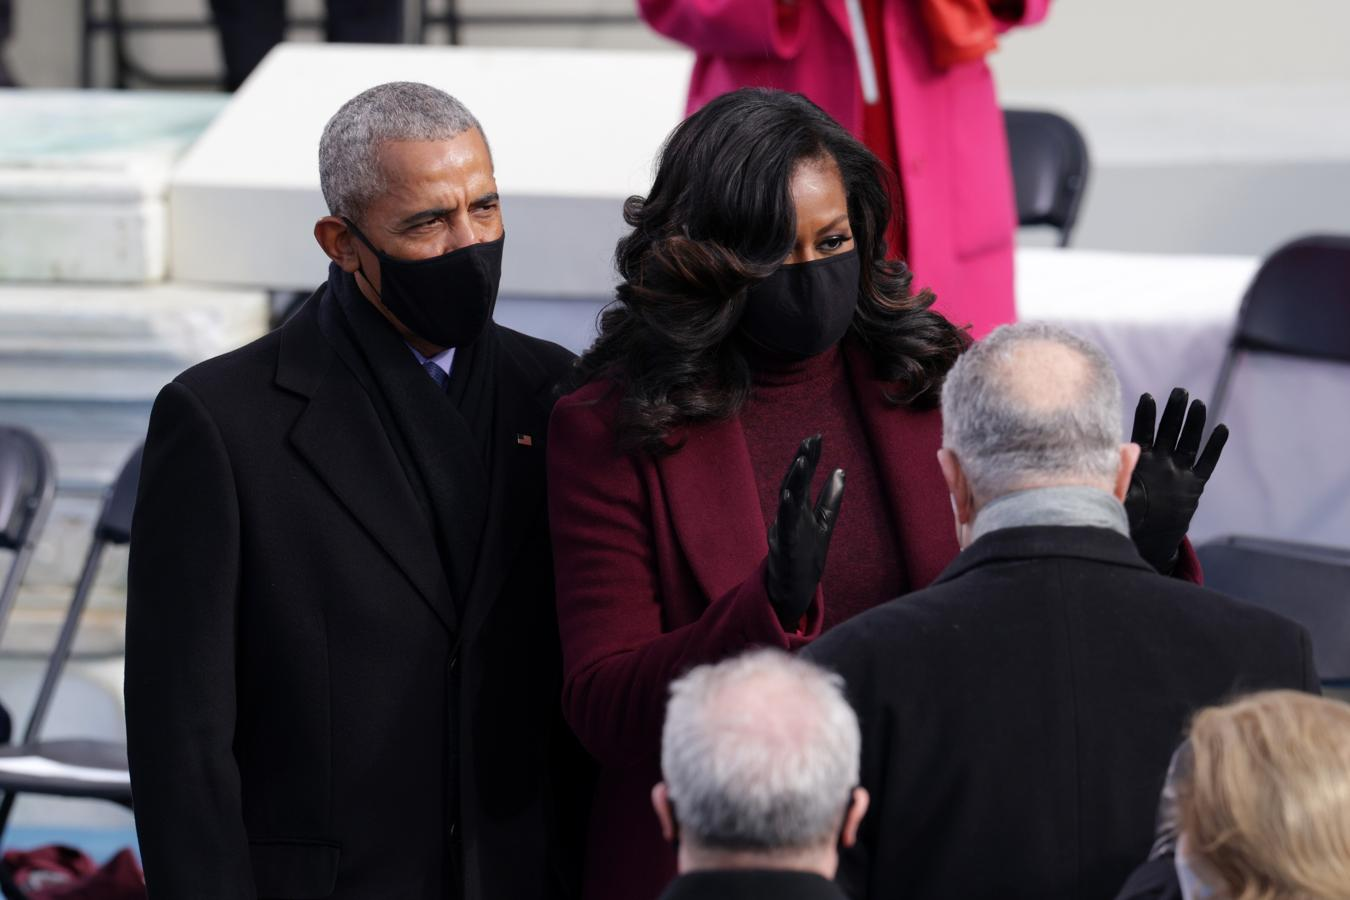 El matrimonio Obama ha acudido a la investidura